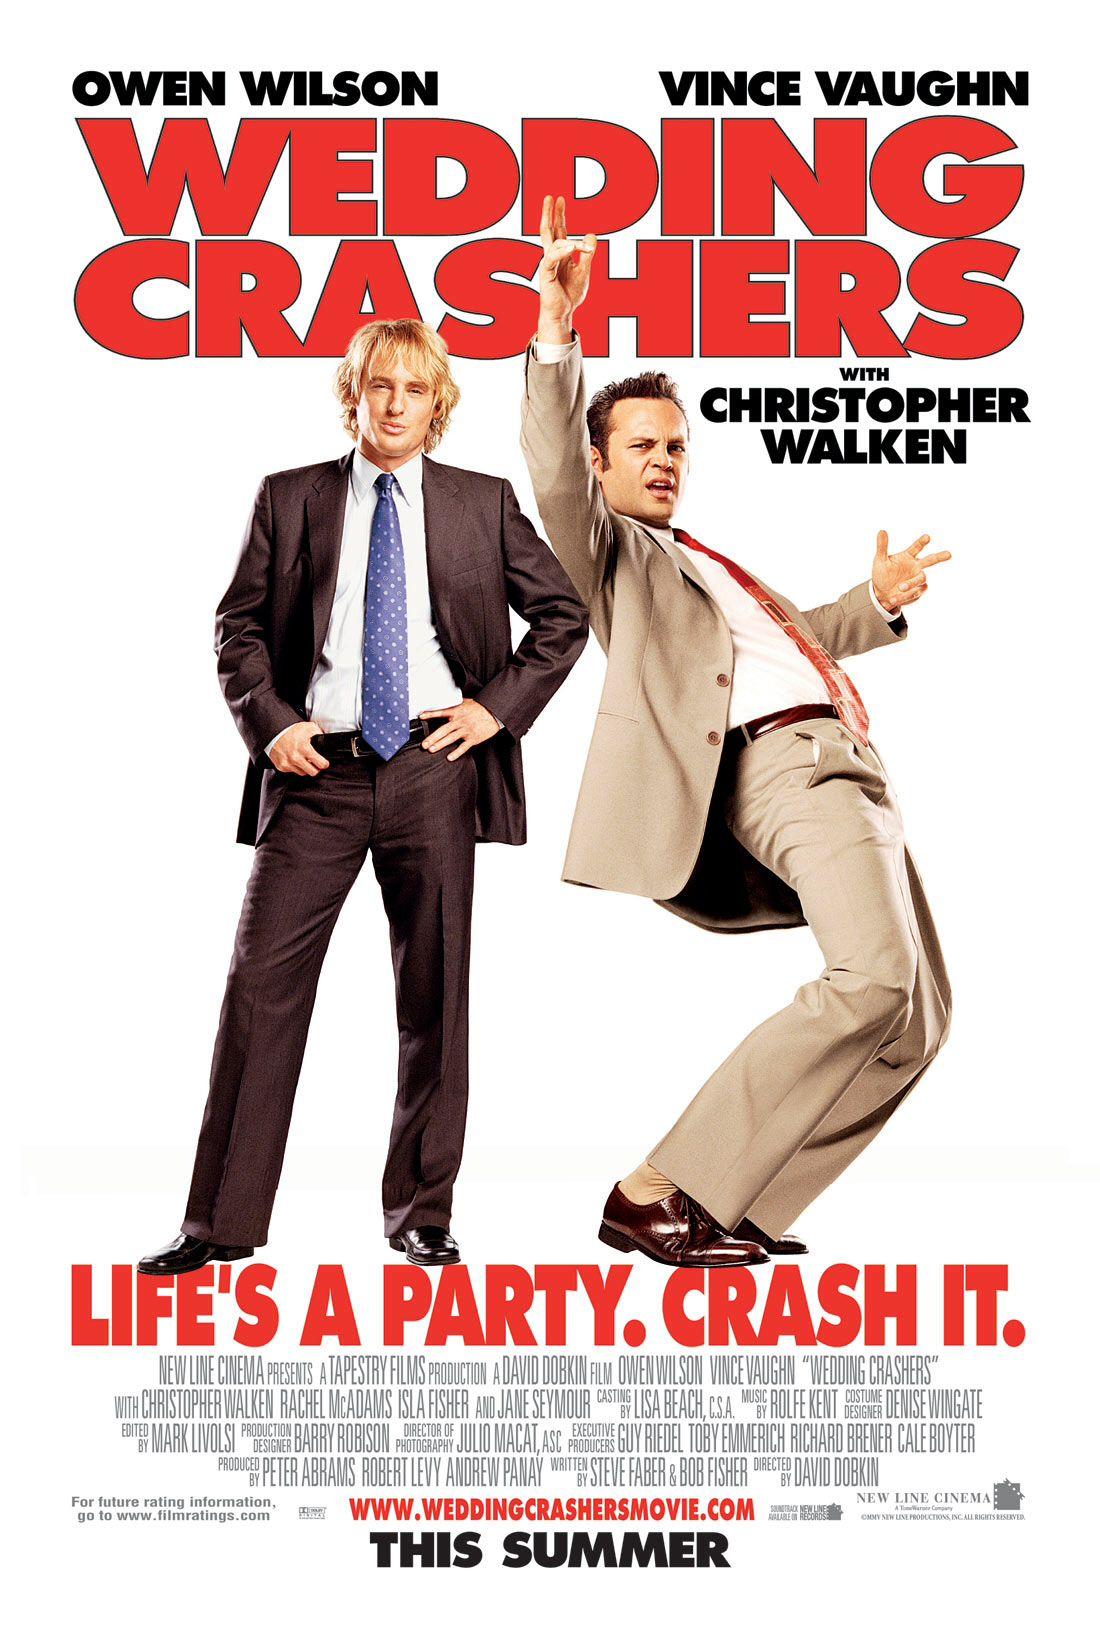 Wedding crashers Los caza novias. (With images) Funny